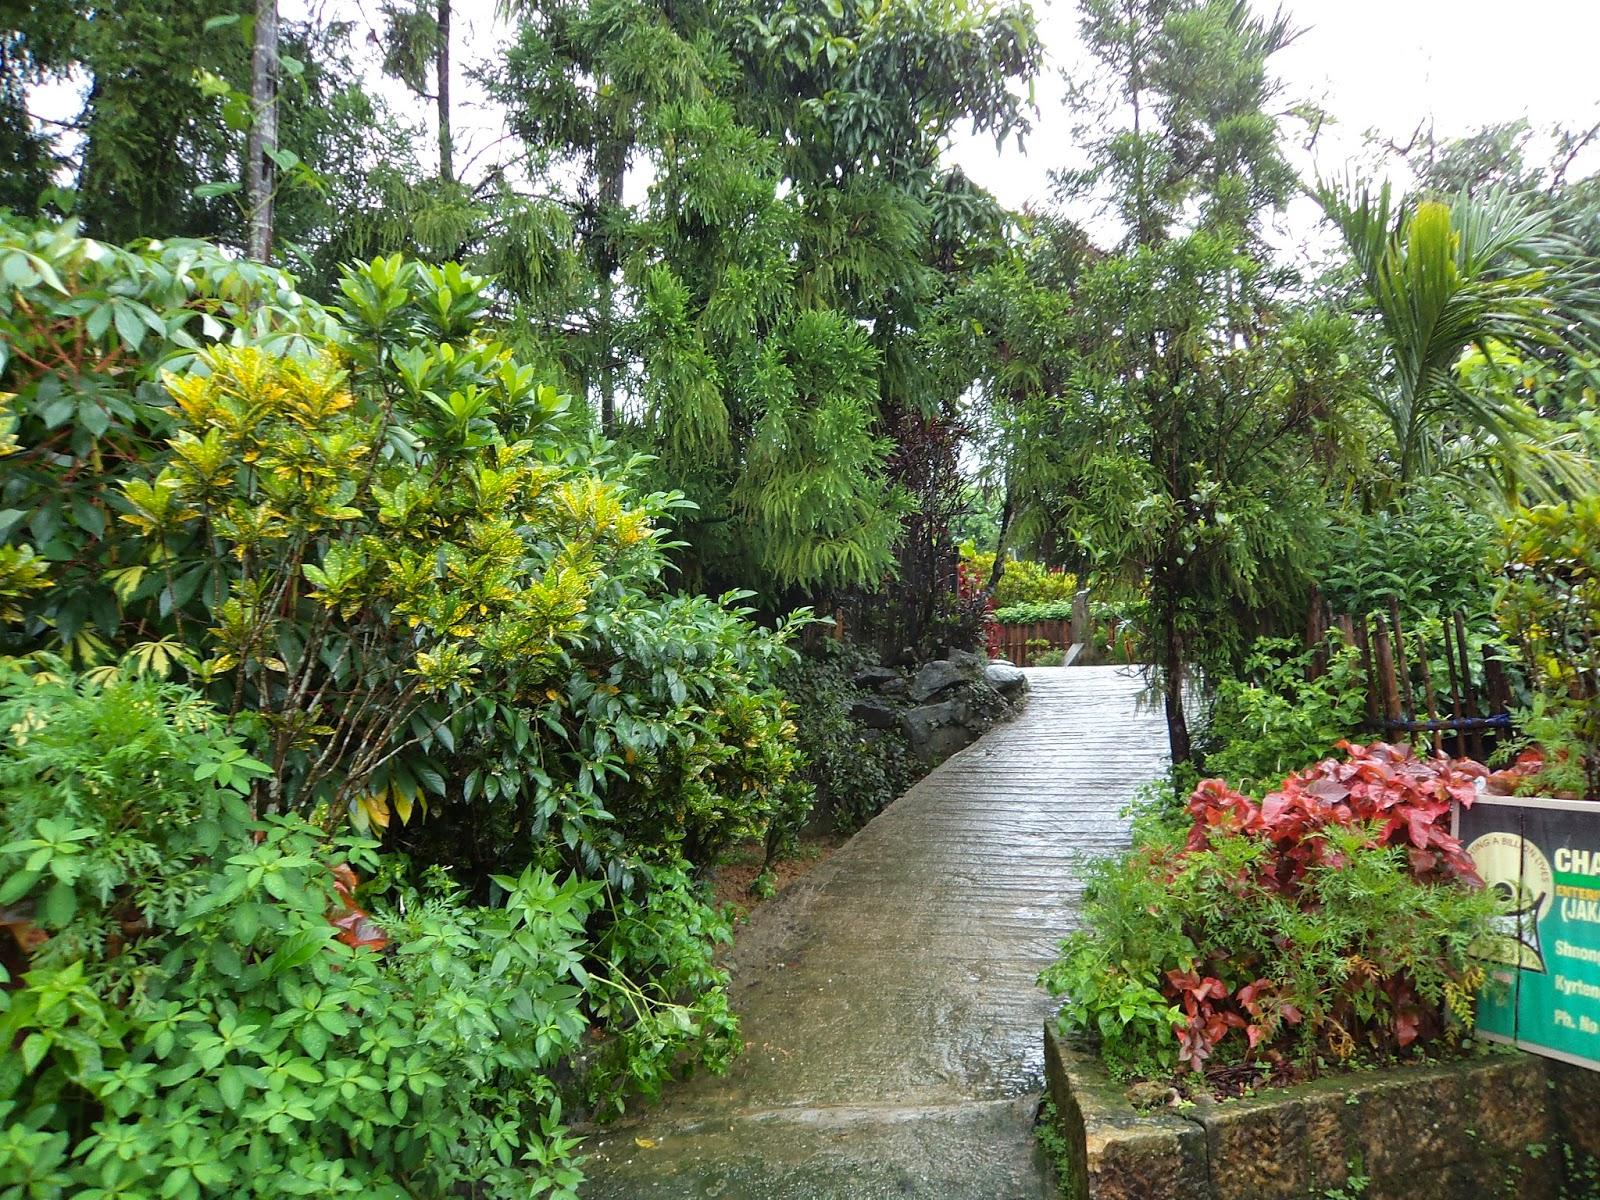 perierga.gr - Το πιο καθαρό χωριό στην Ασία δίνει παράδειγμα στον κόσμο!